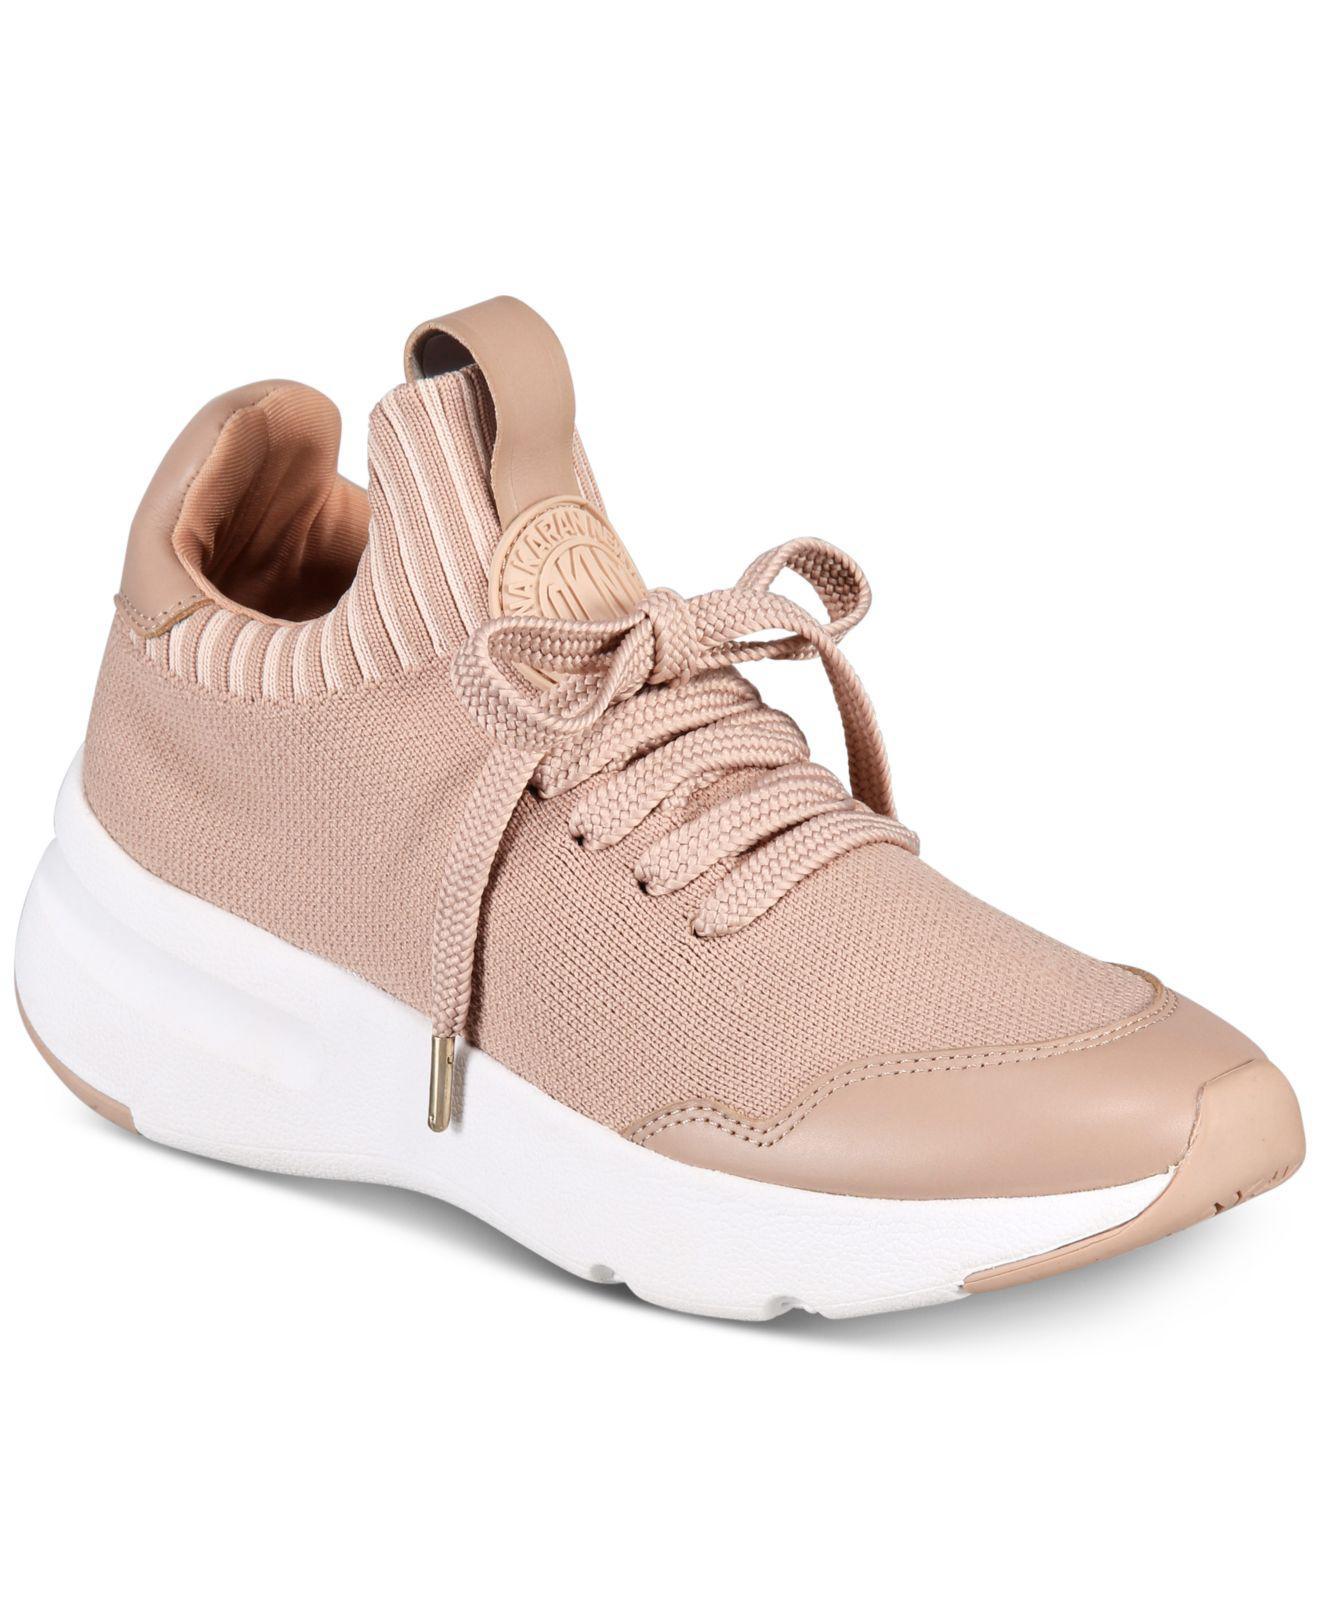 DKNY Pamela Sneakers, Created For Macy